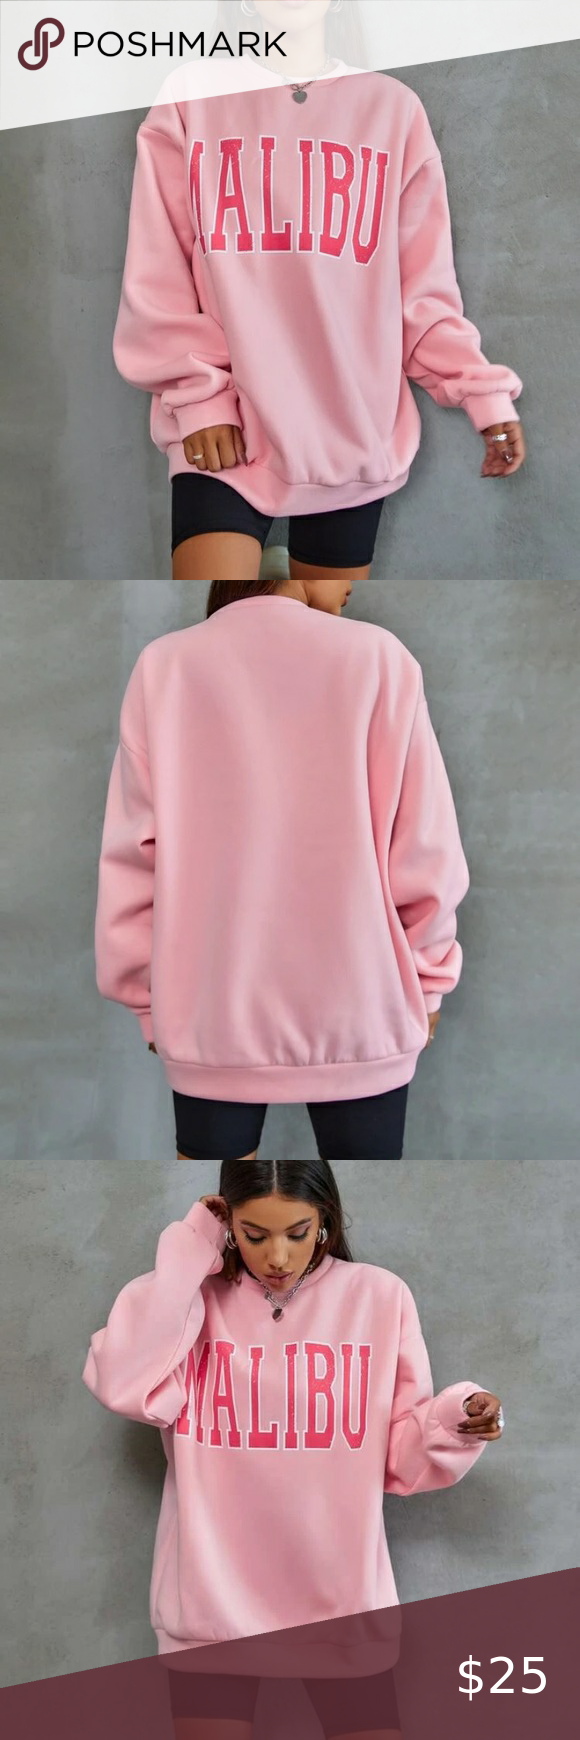 Shein Pink Malibu Graphic Crew Neck Sweatshirt Graphic Crew Neck Sweatshirts Sweatshirts Crew Neck Sweatshirt [ 1740 x 580 Pixel ]